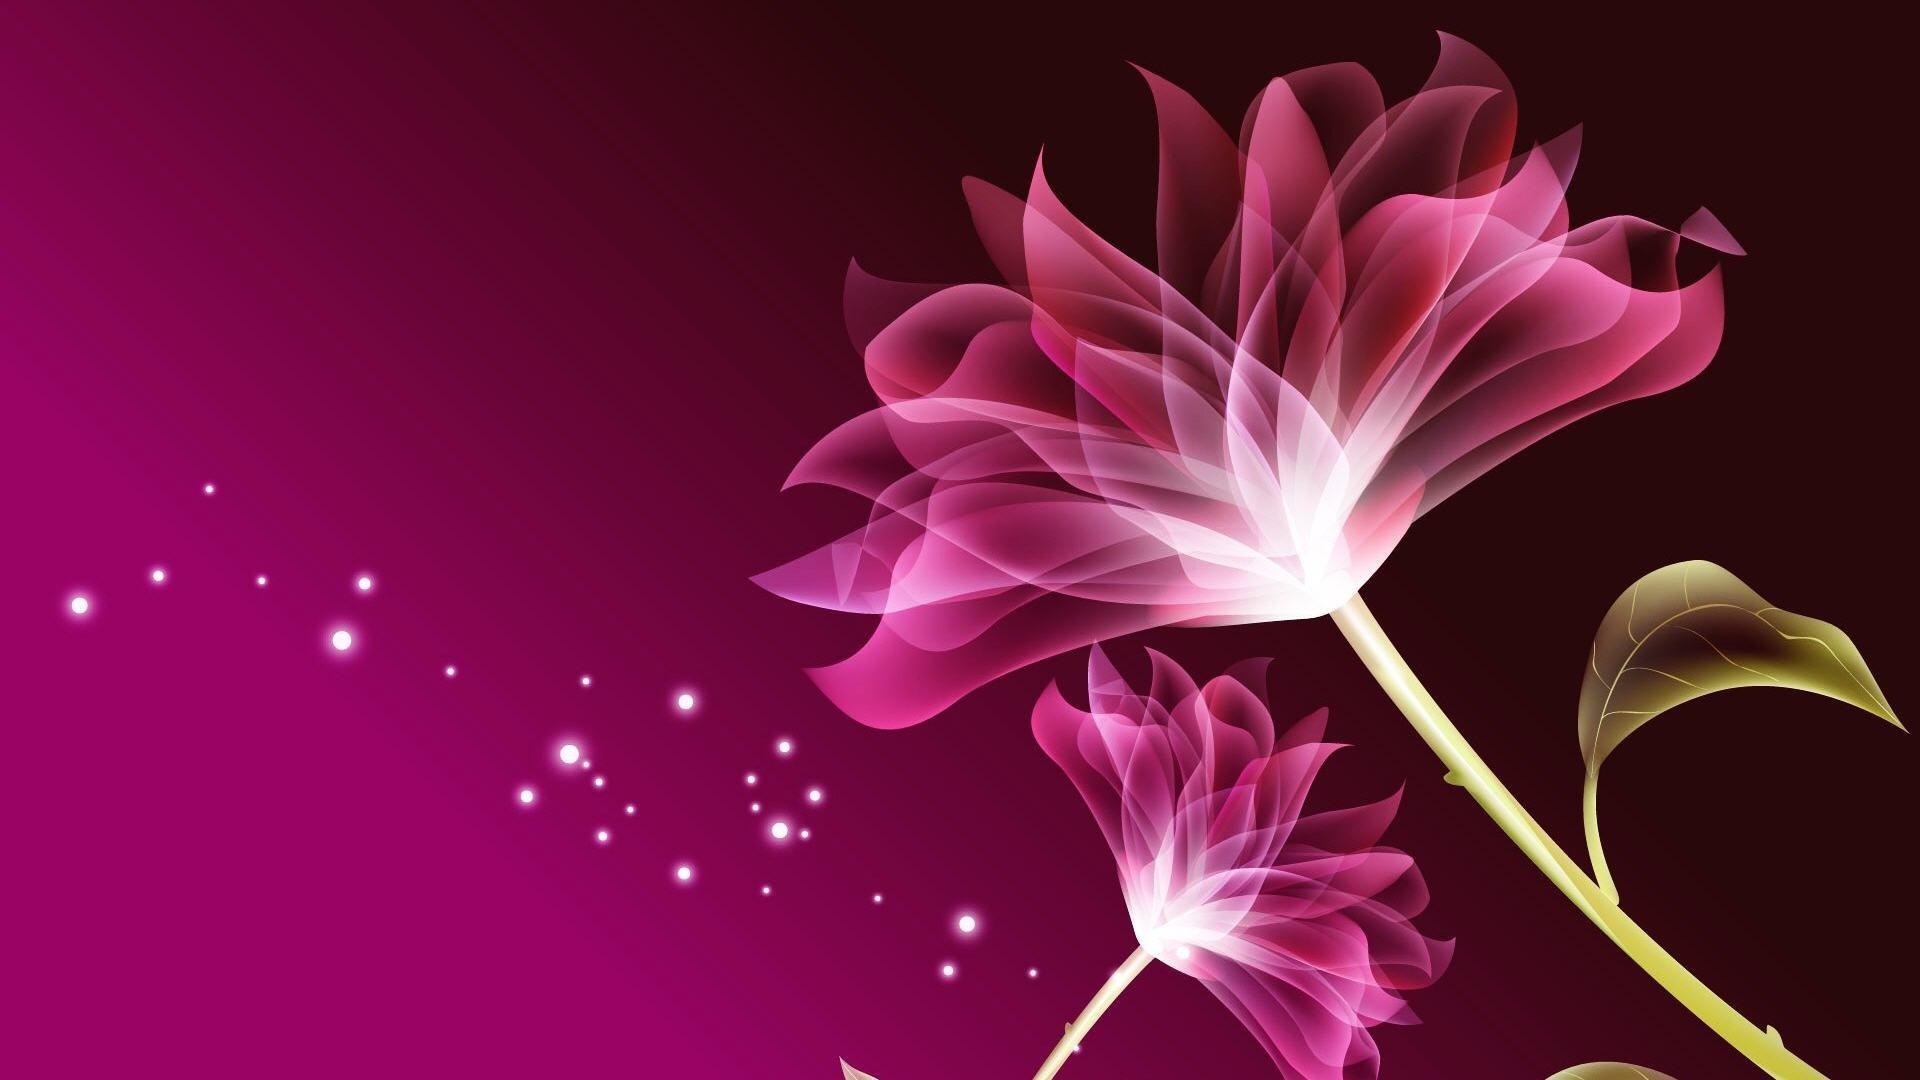 Desktop Background Flowers Wallpapers